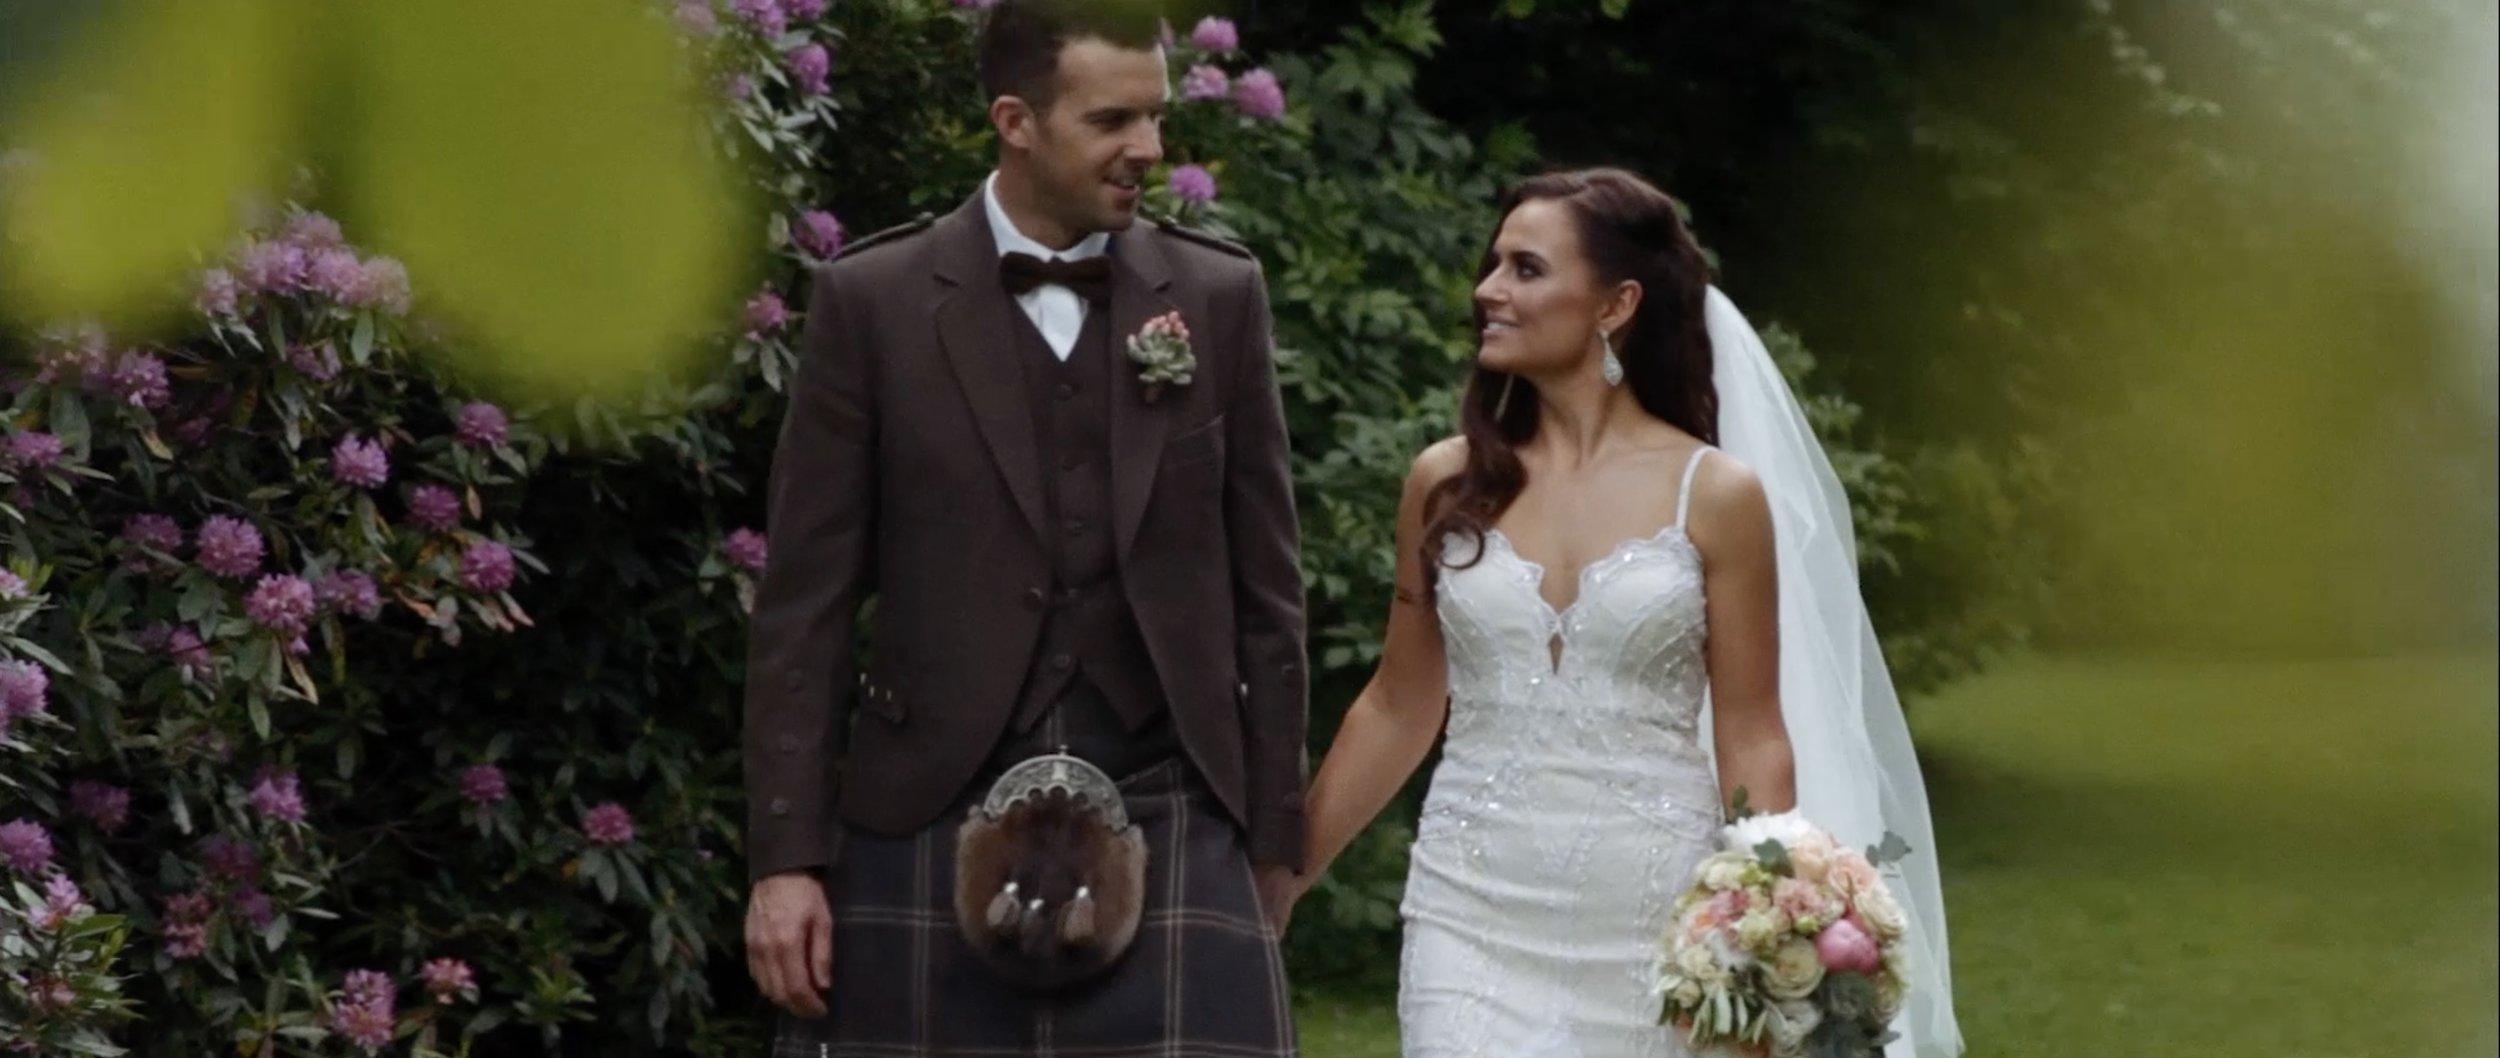 hotel-du-vin-at-one-devonshire-gardens-wedding-videographer_LL_06.jpg